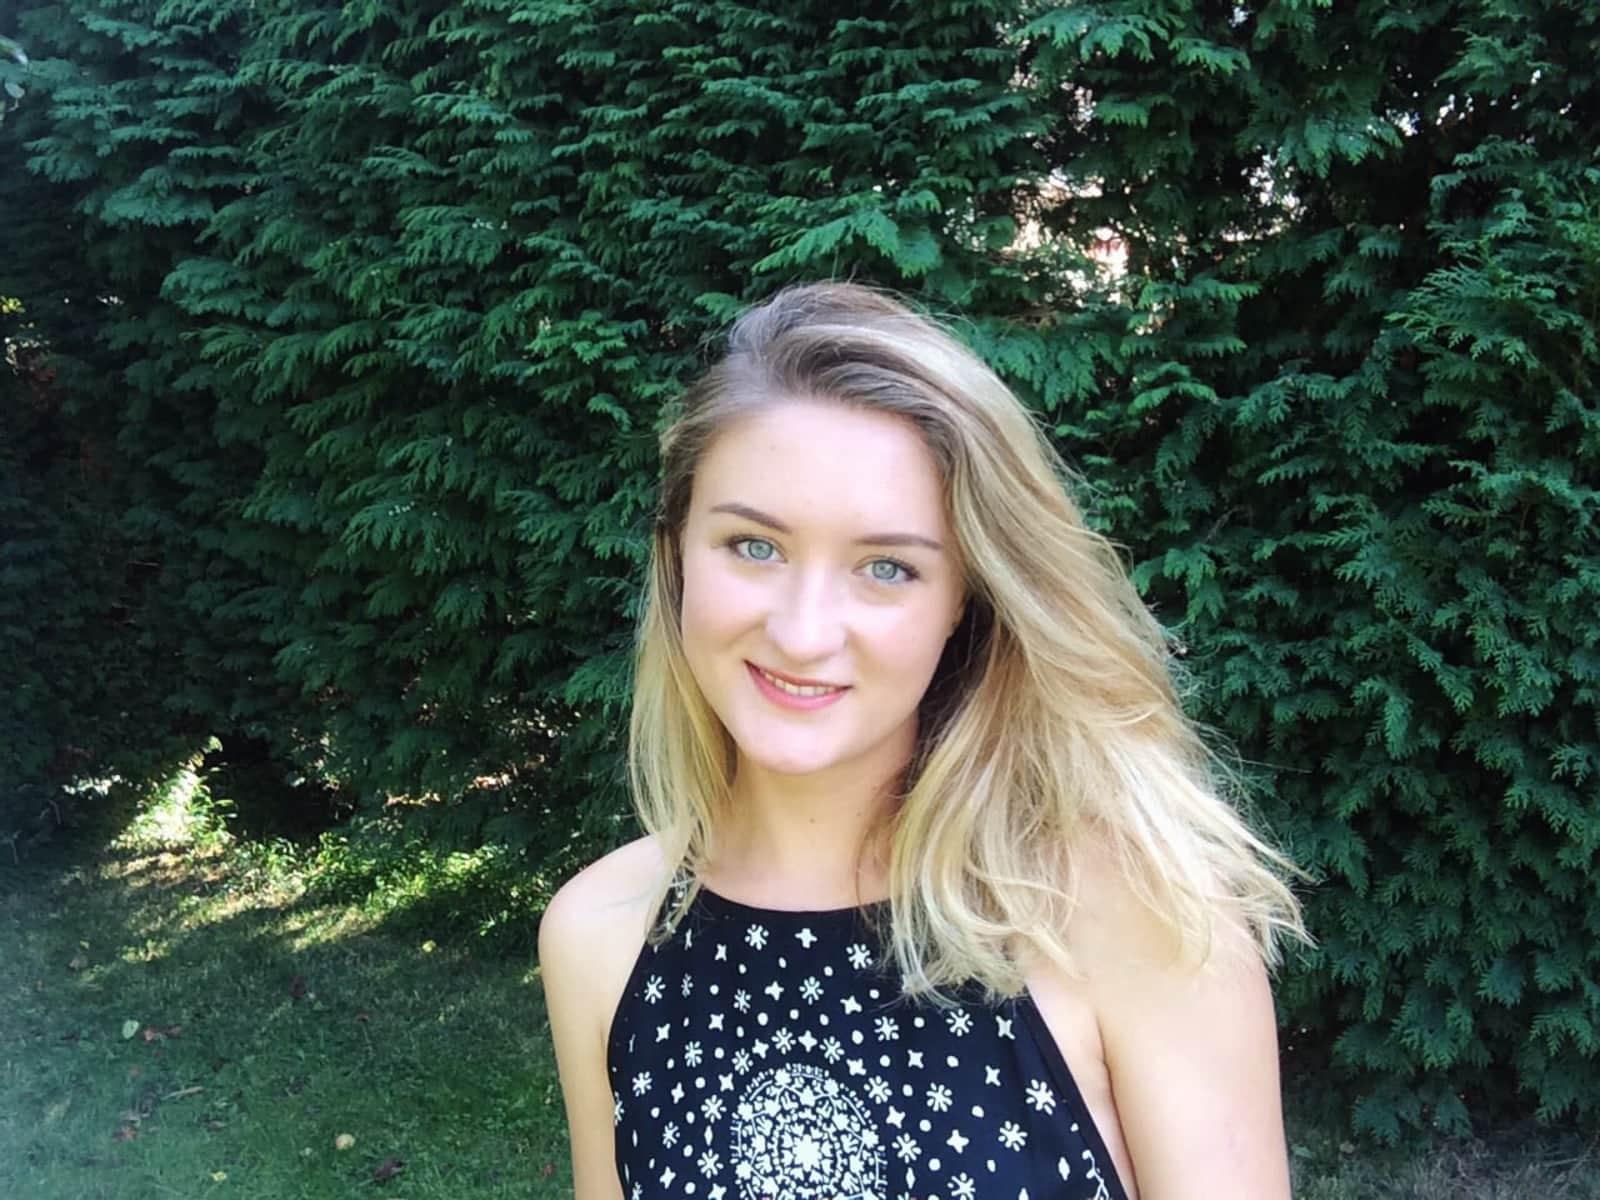 Caroline from London, United Kingdom